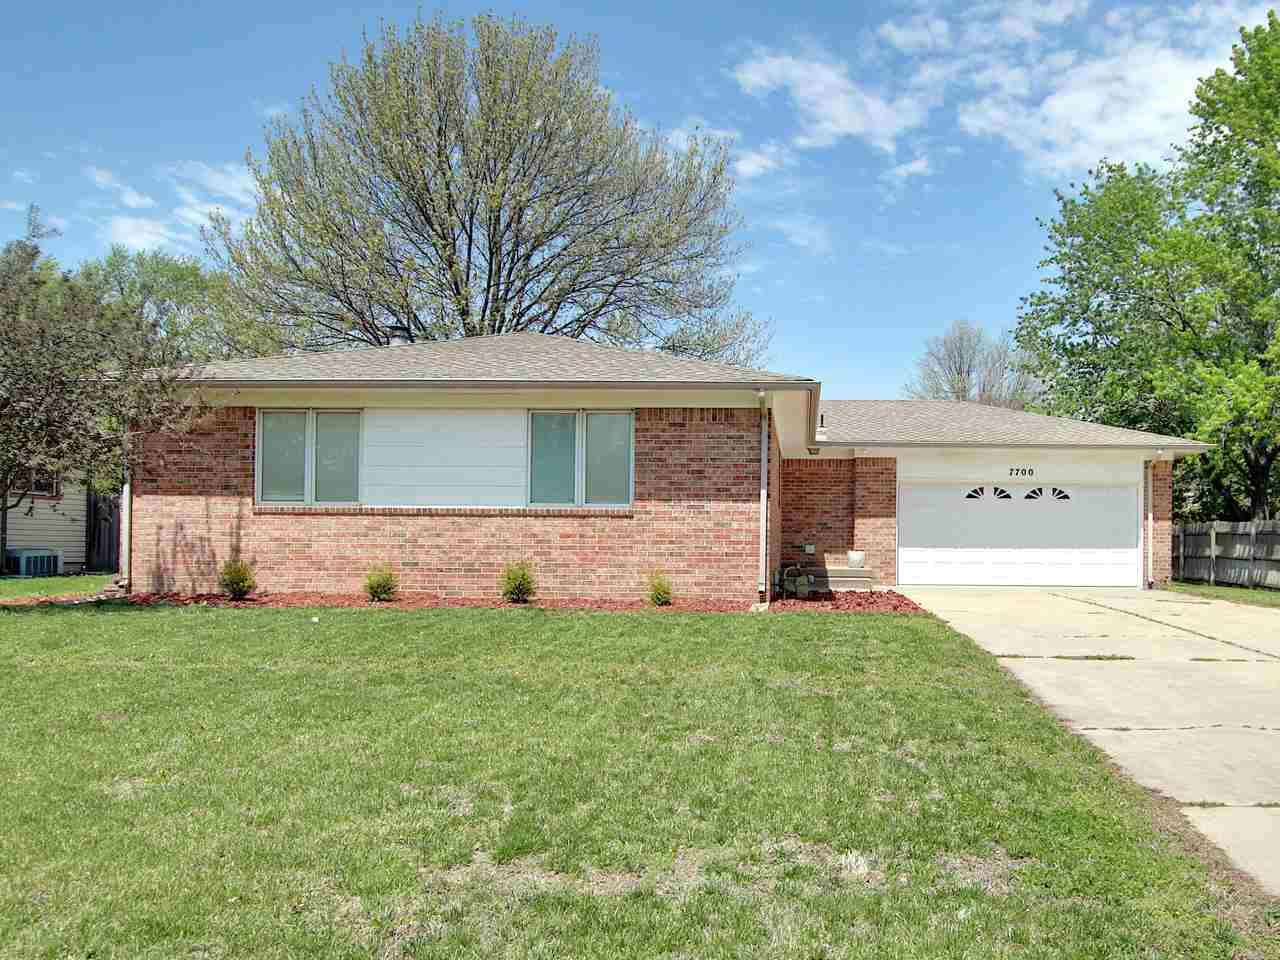 7700 W Suncrest St, Wichita, KS, 67212